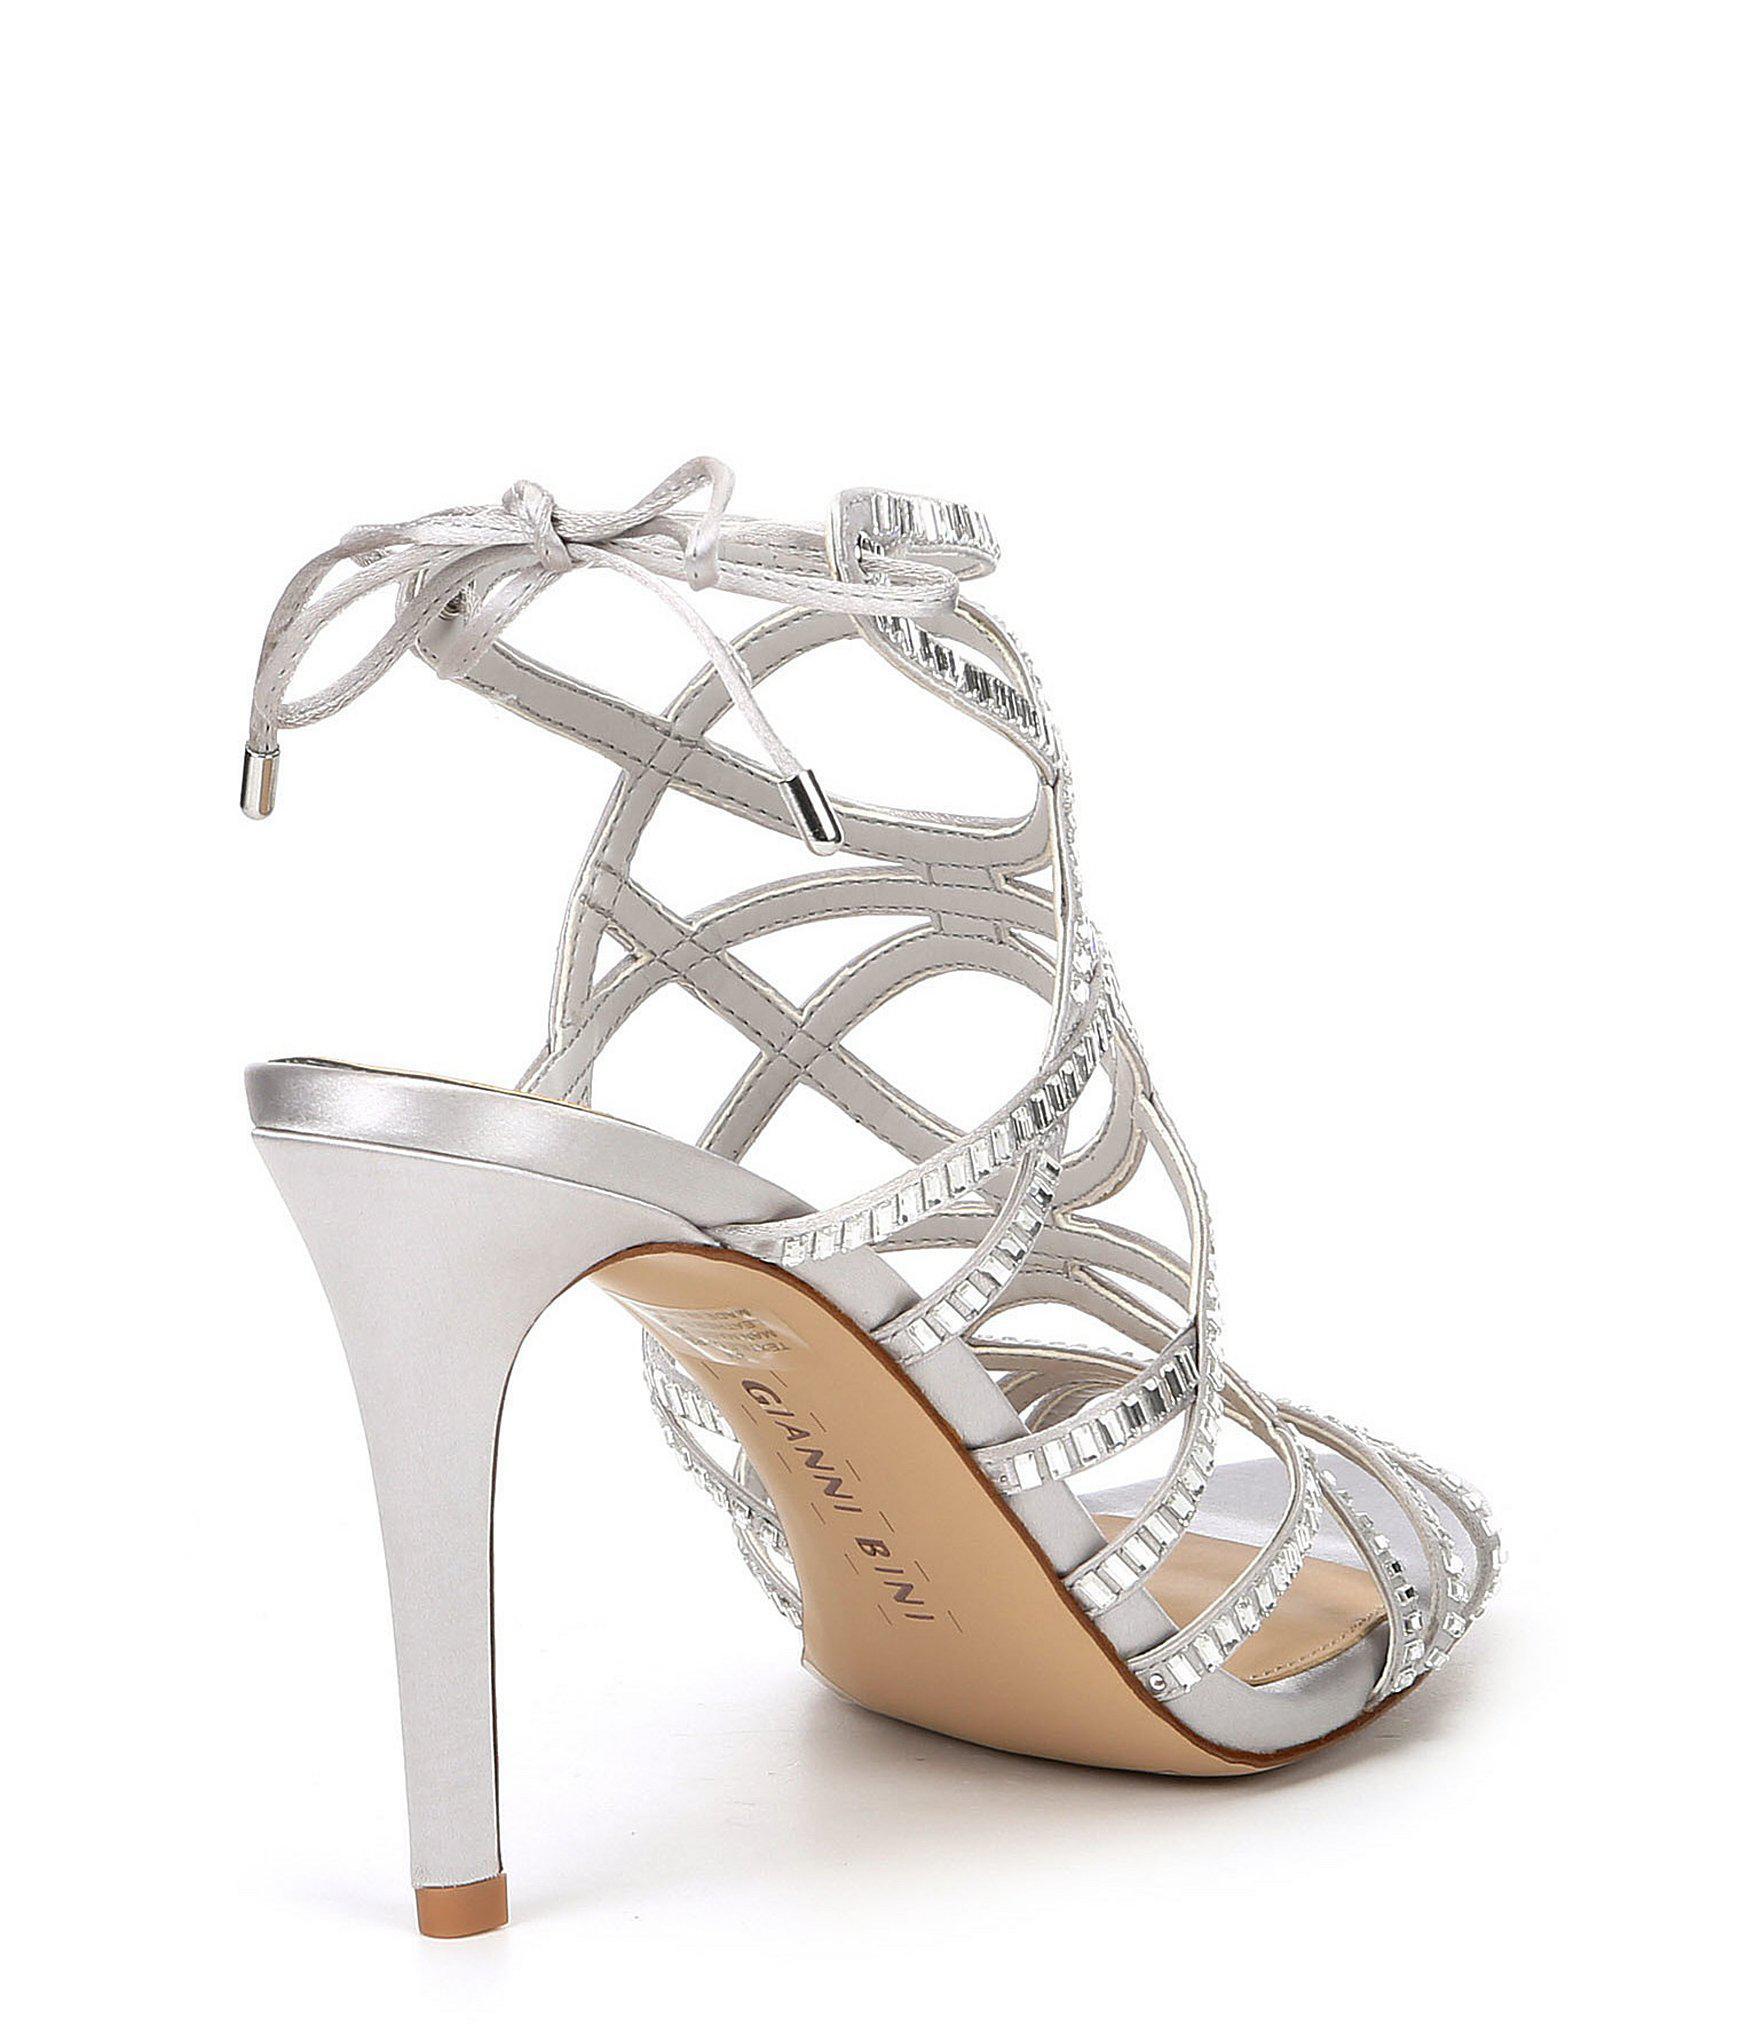 5408c5c63384 Lyst - Gianni Bini Kellzie Satin Jeweled Caged Dress Sandals in Metallic